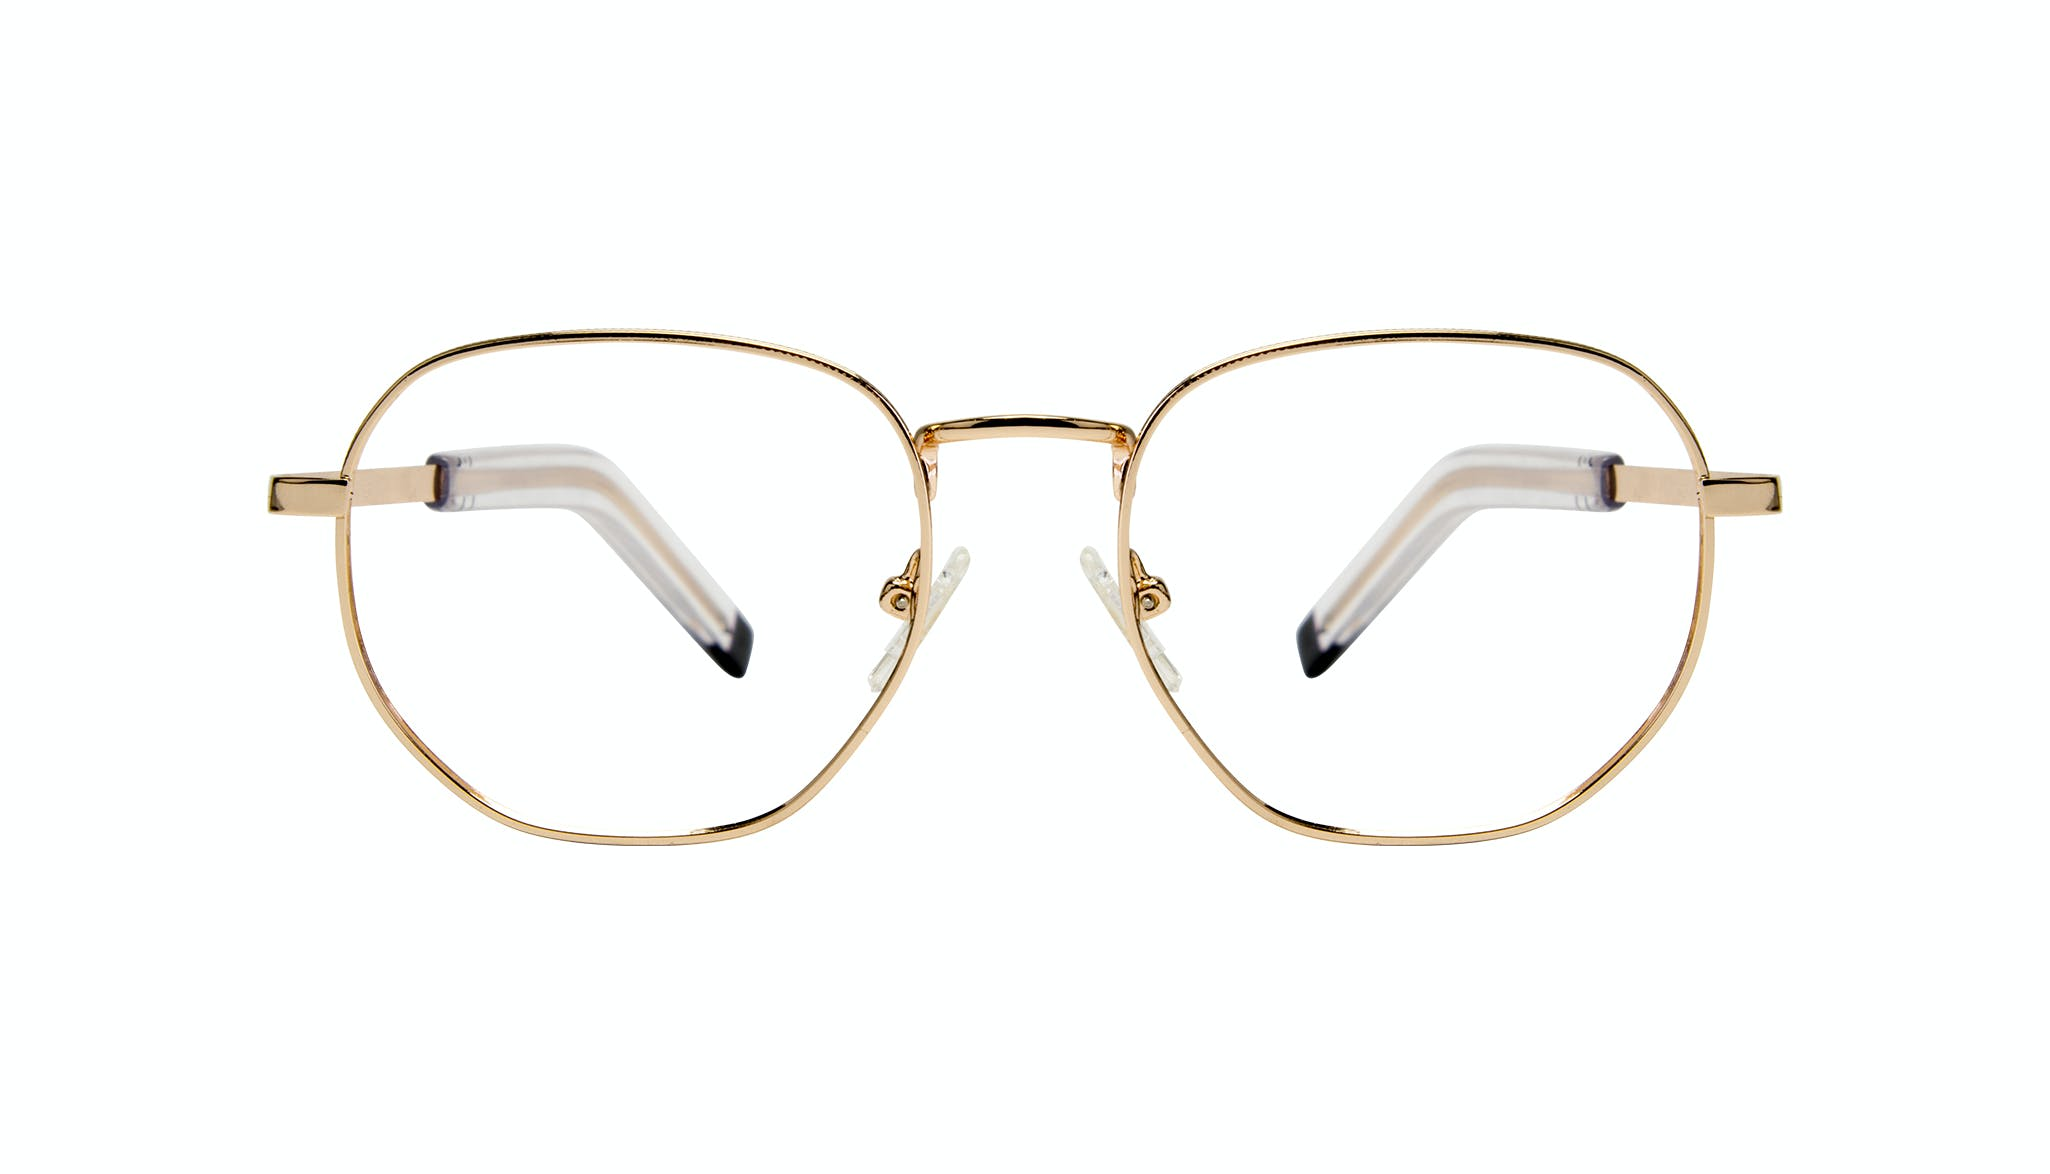 Affordable Fashion Glasses Round Eyeglasses Men Rise Gold Front